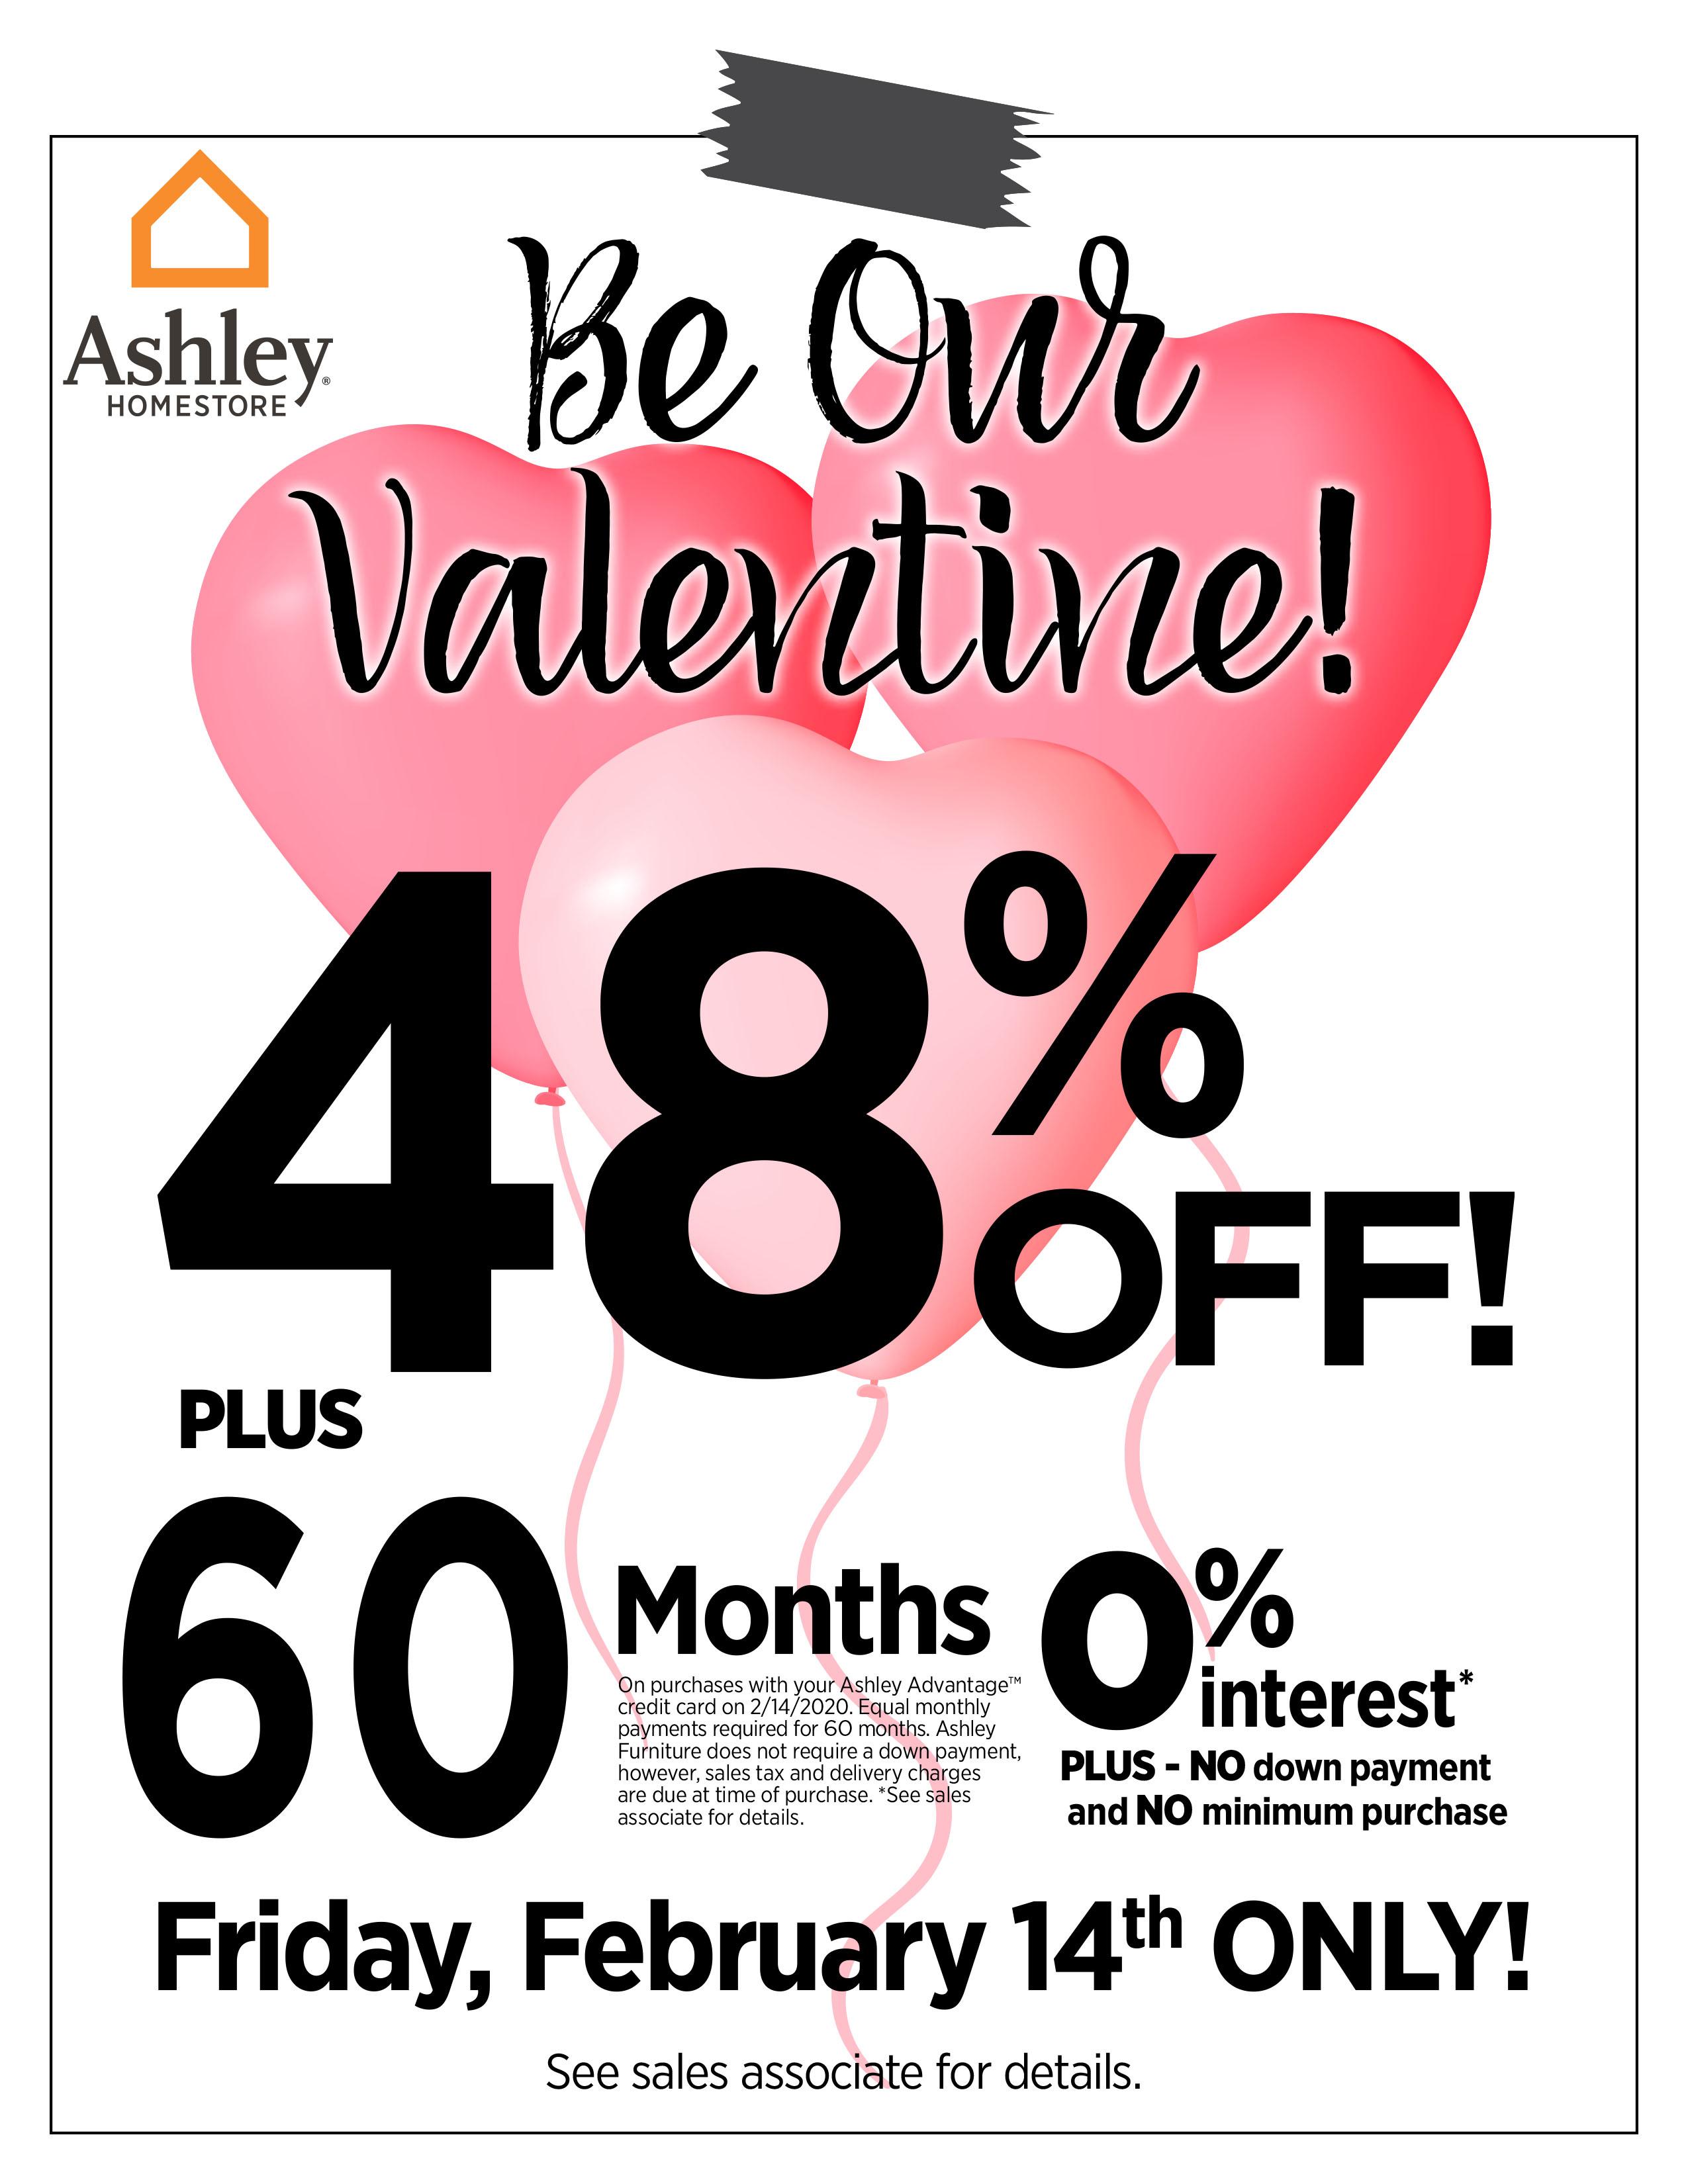 ashley-homestore-valentines-day-sale